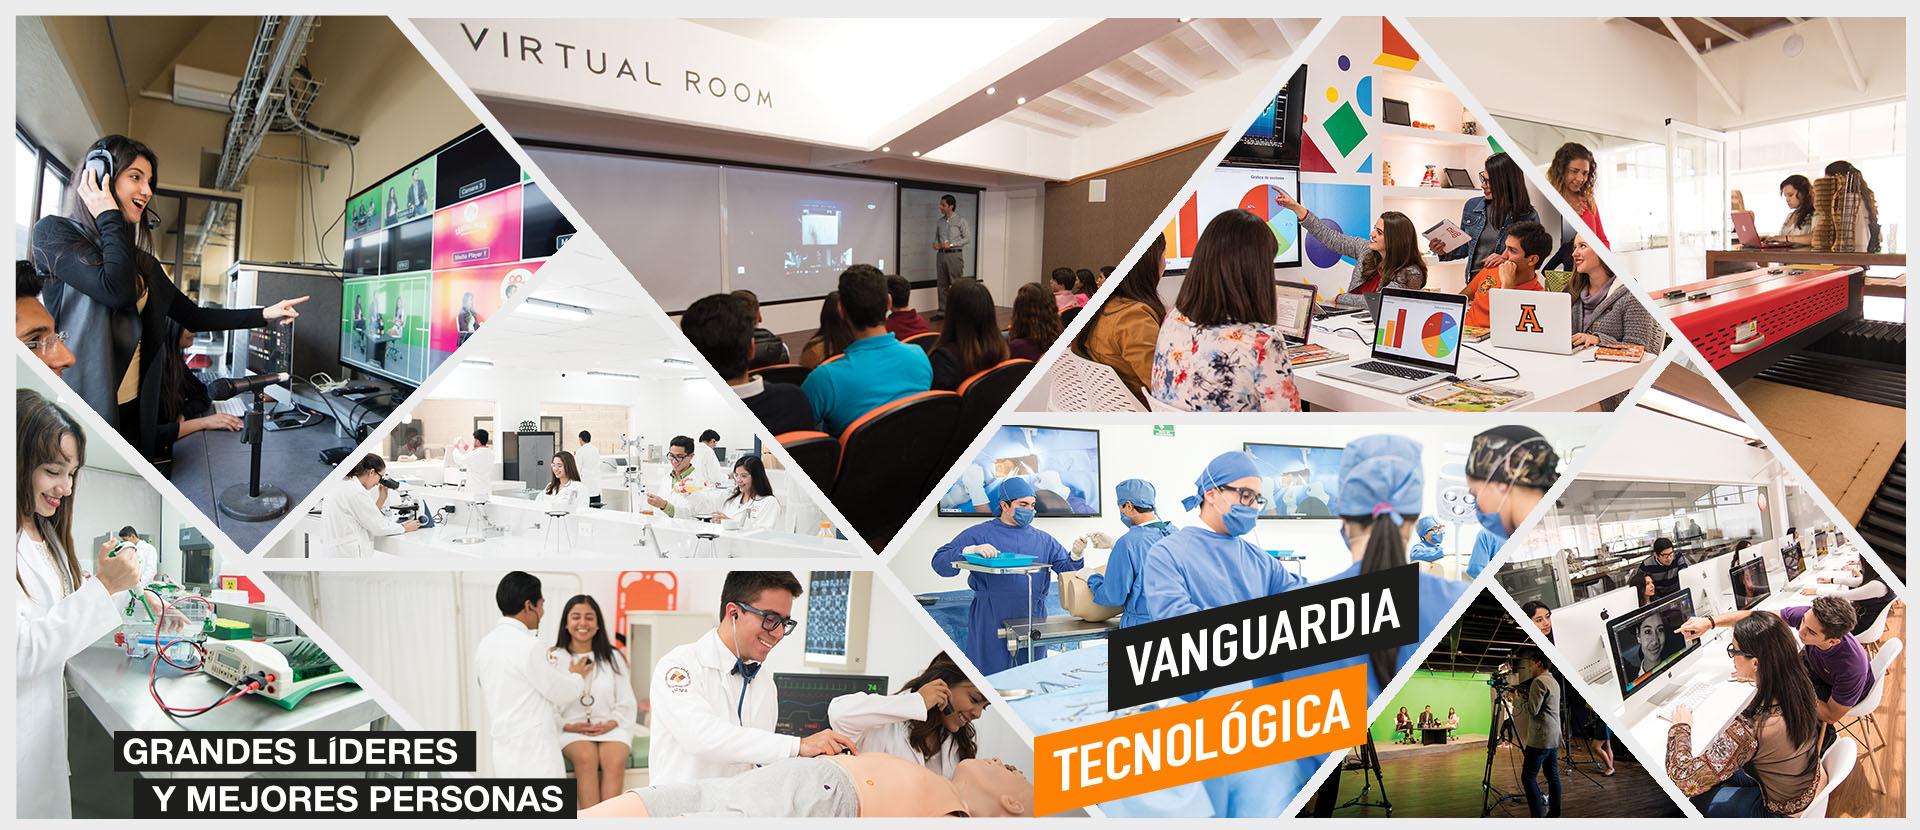 Vanguardia Tecnológica